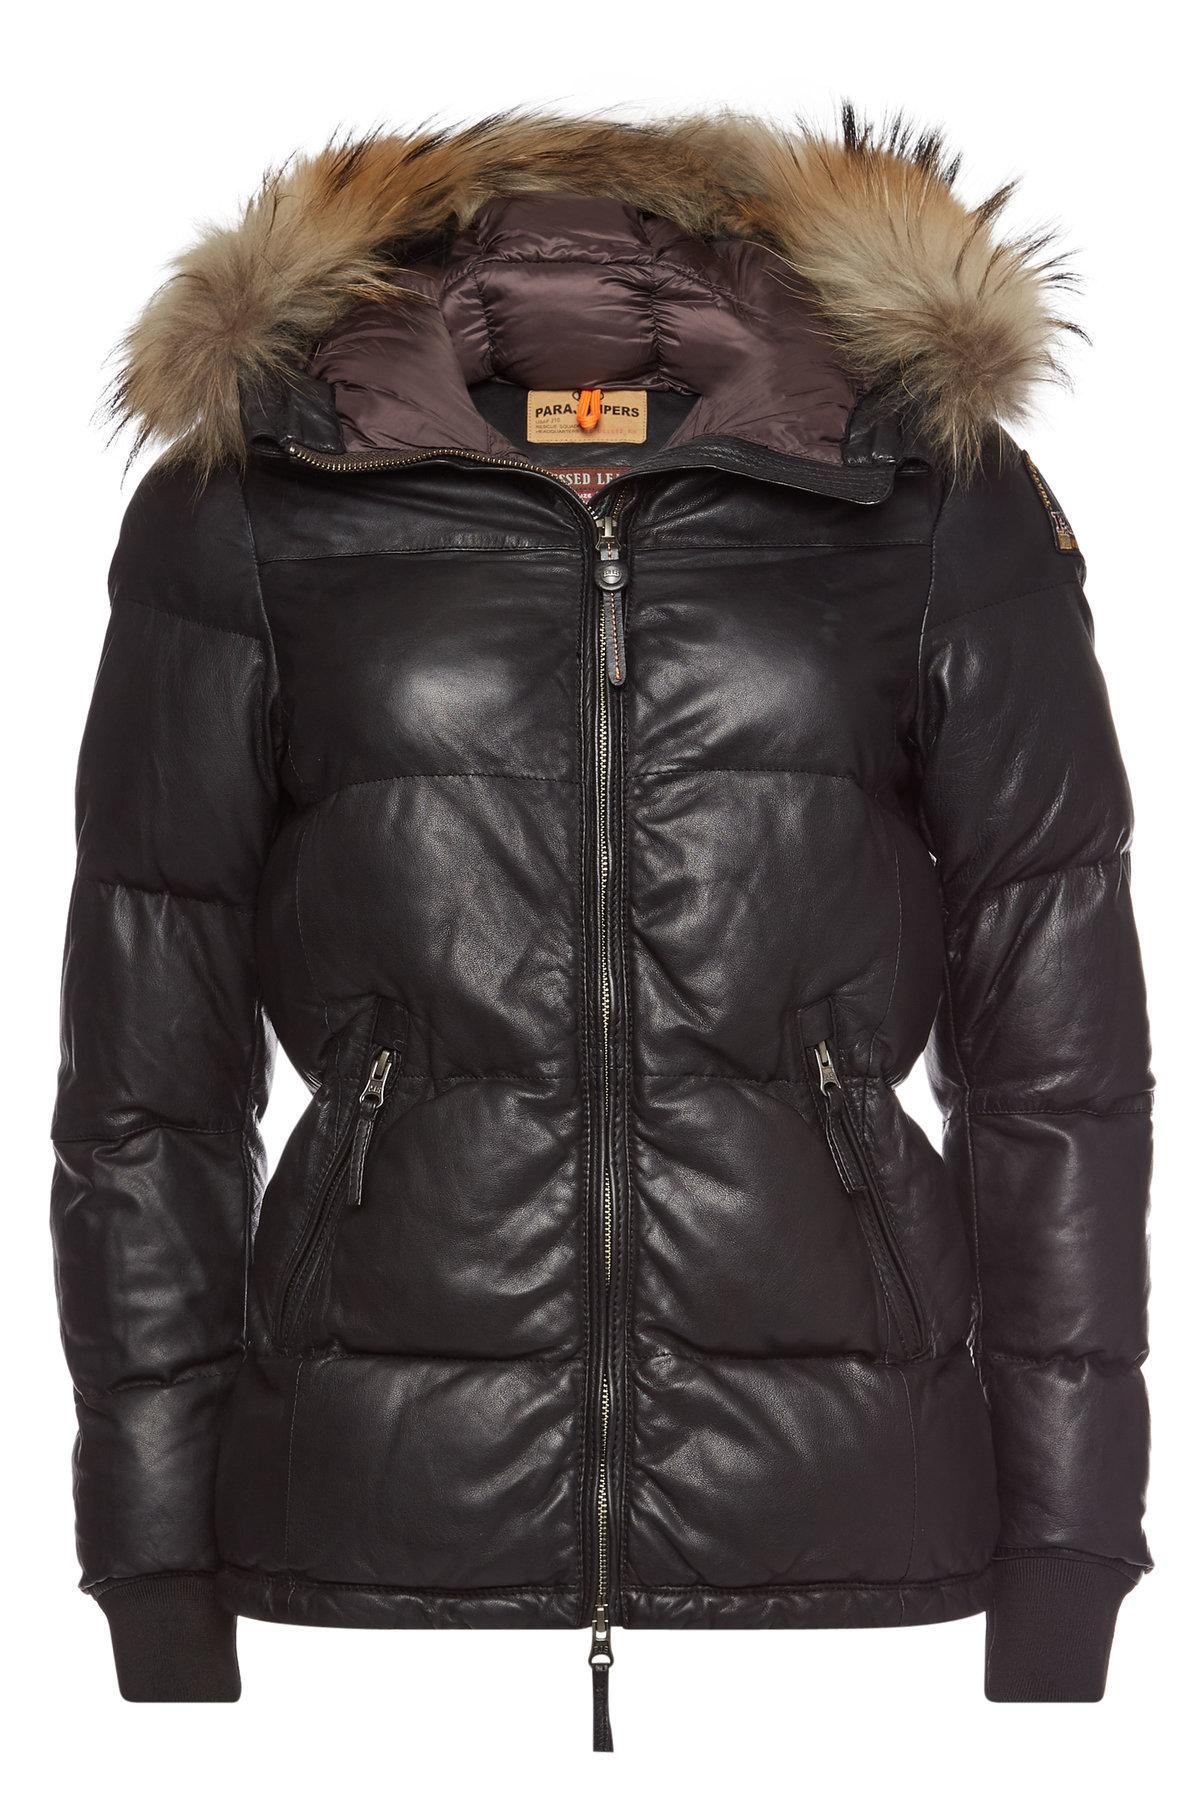 parajumpers varsity jacket